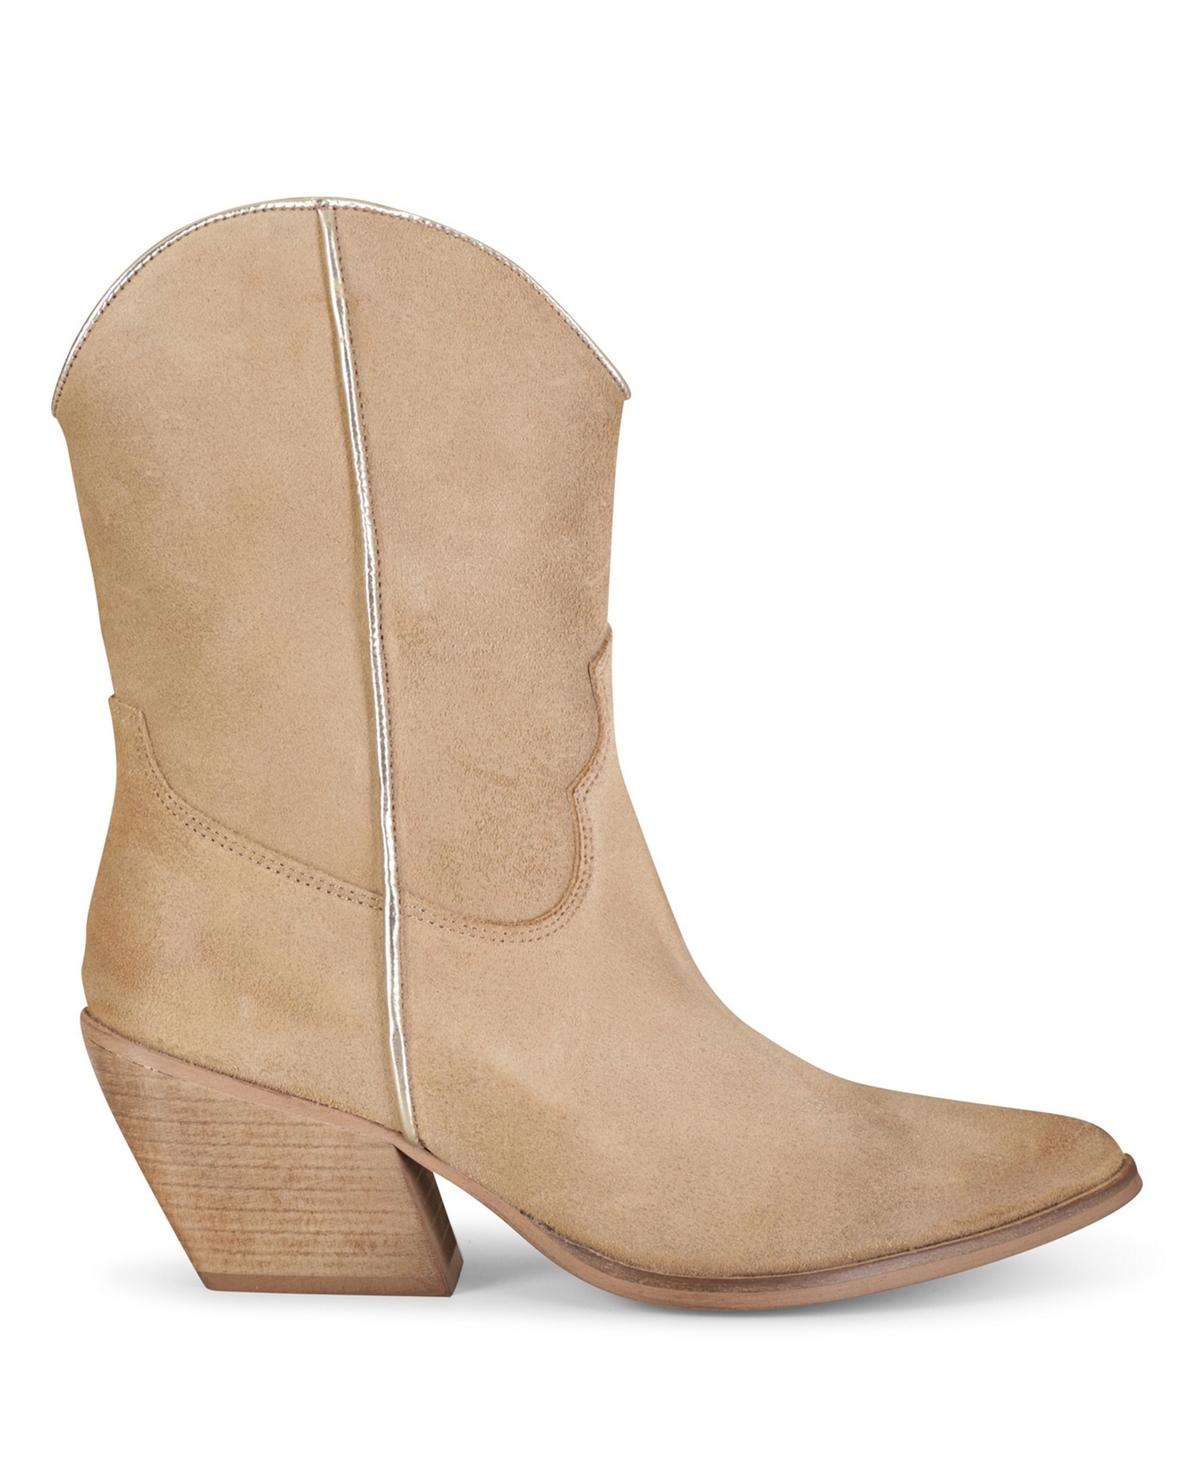 Shoecolate Beige 8.20.08.057